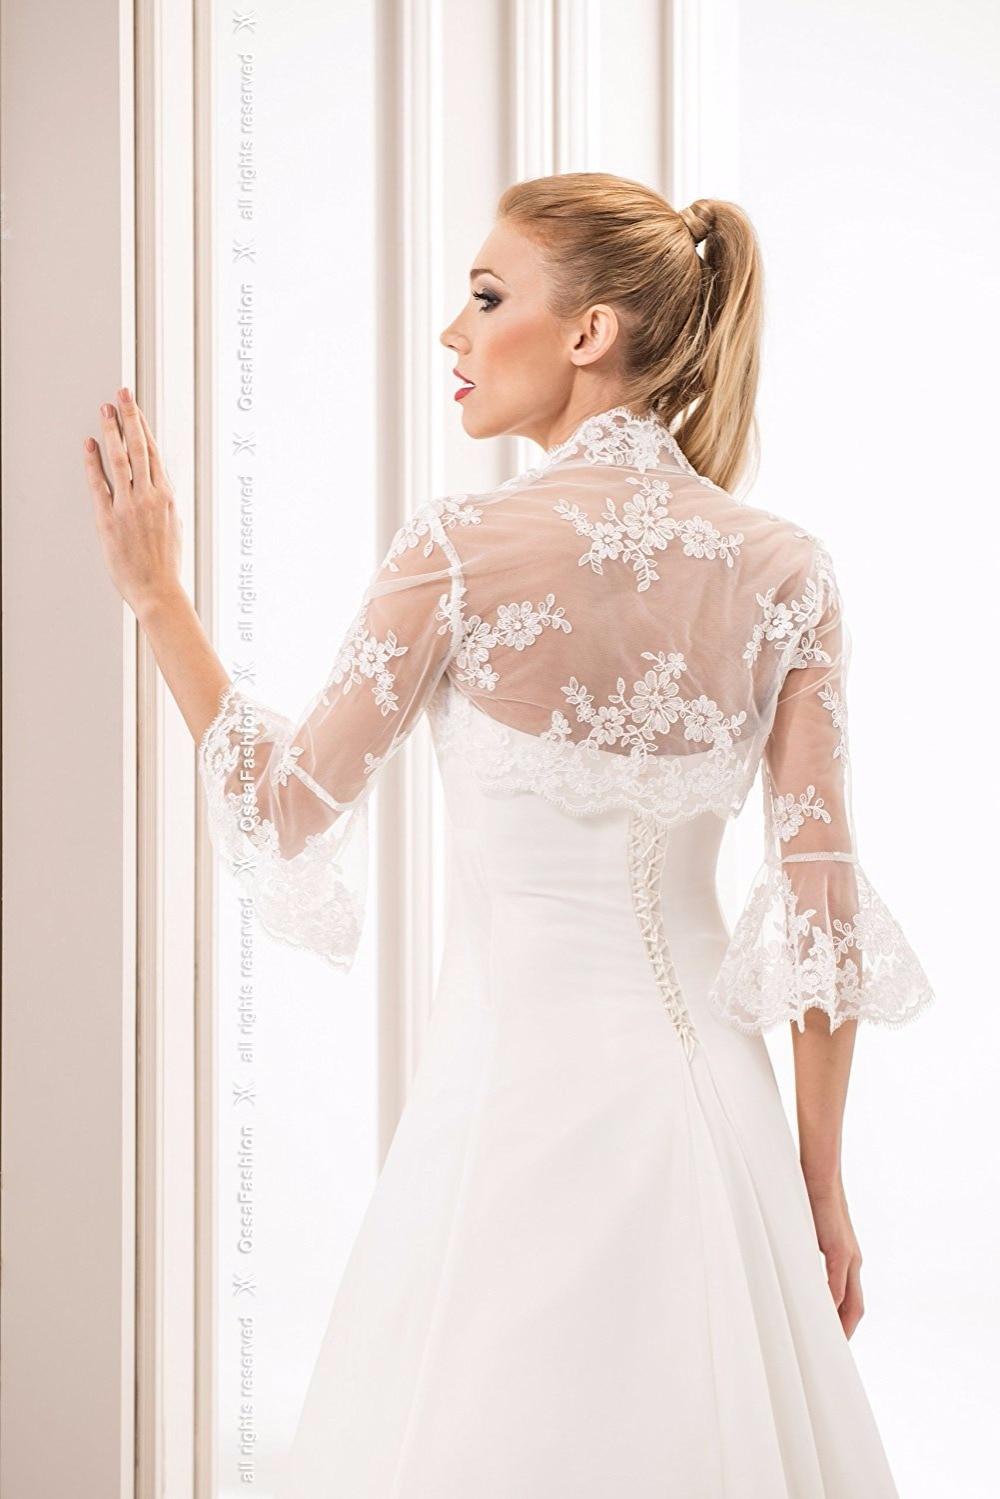 2017 Wedding Jacket Appliqued Long Sleeve Bolero women Cheap For Bridal Wrap Mariage Free Shipping in Wedding Jackets Wrap from Weddings Events